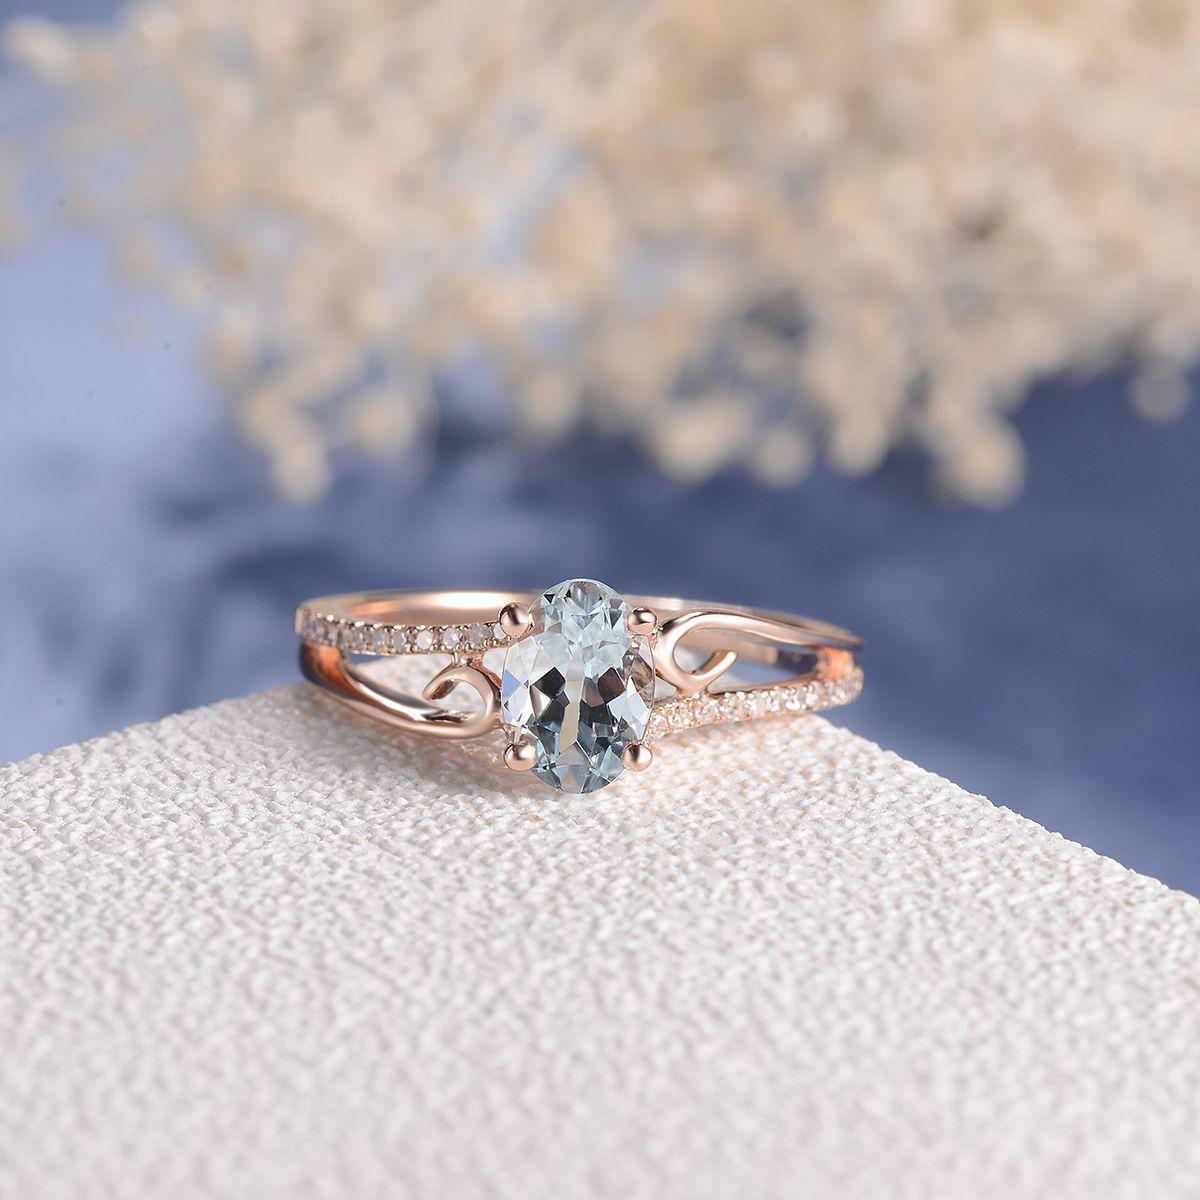 Vine Ring Aquamarine Engagement Ring White Gold Women